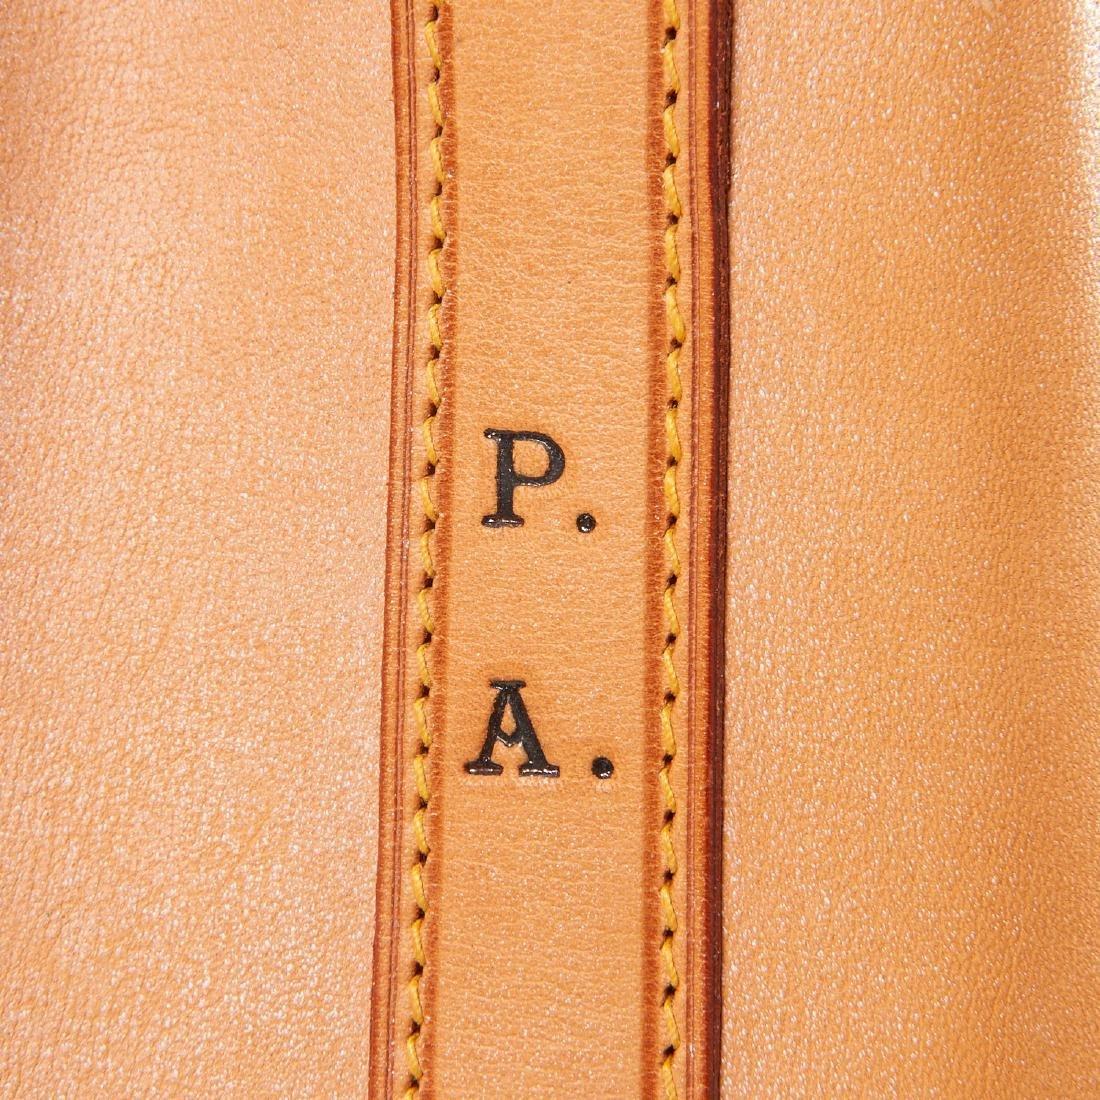 Louis Vuitton all leather drawstring handbag - 5